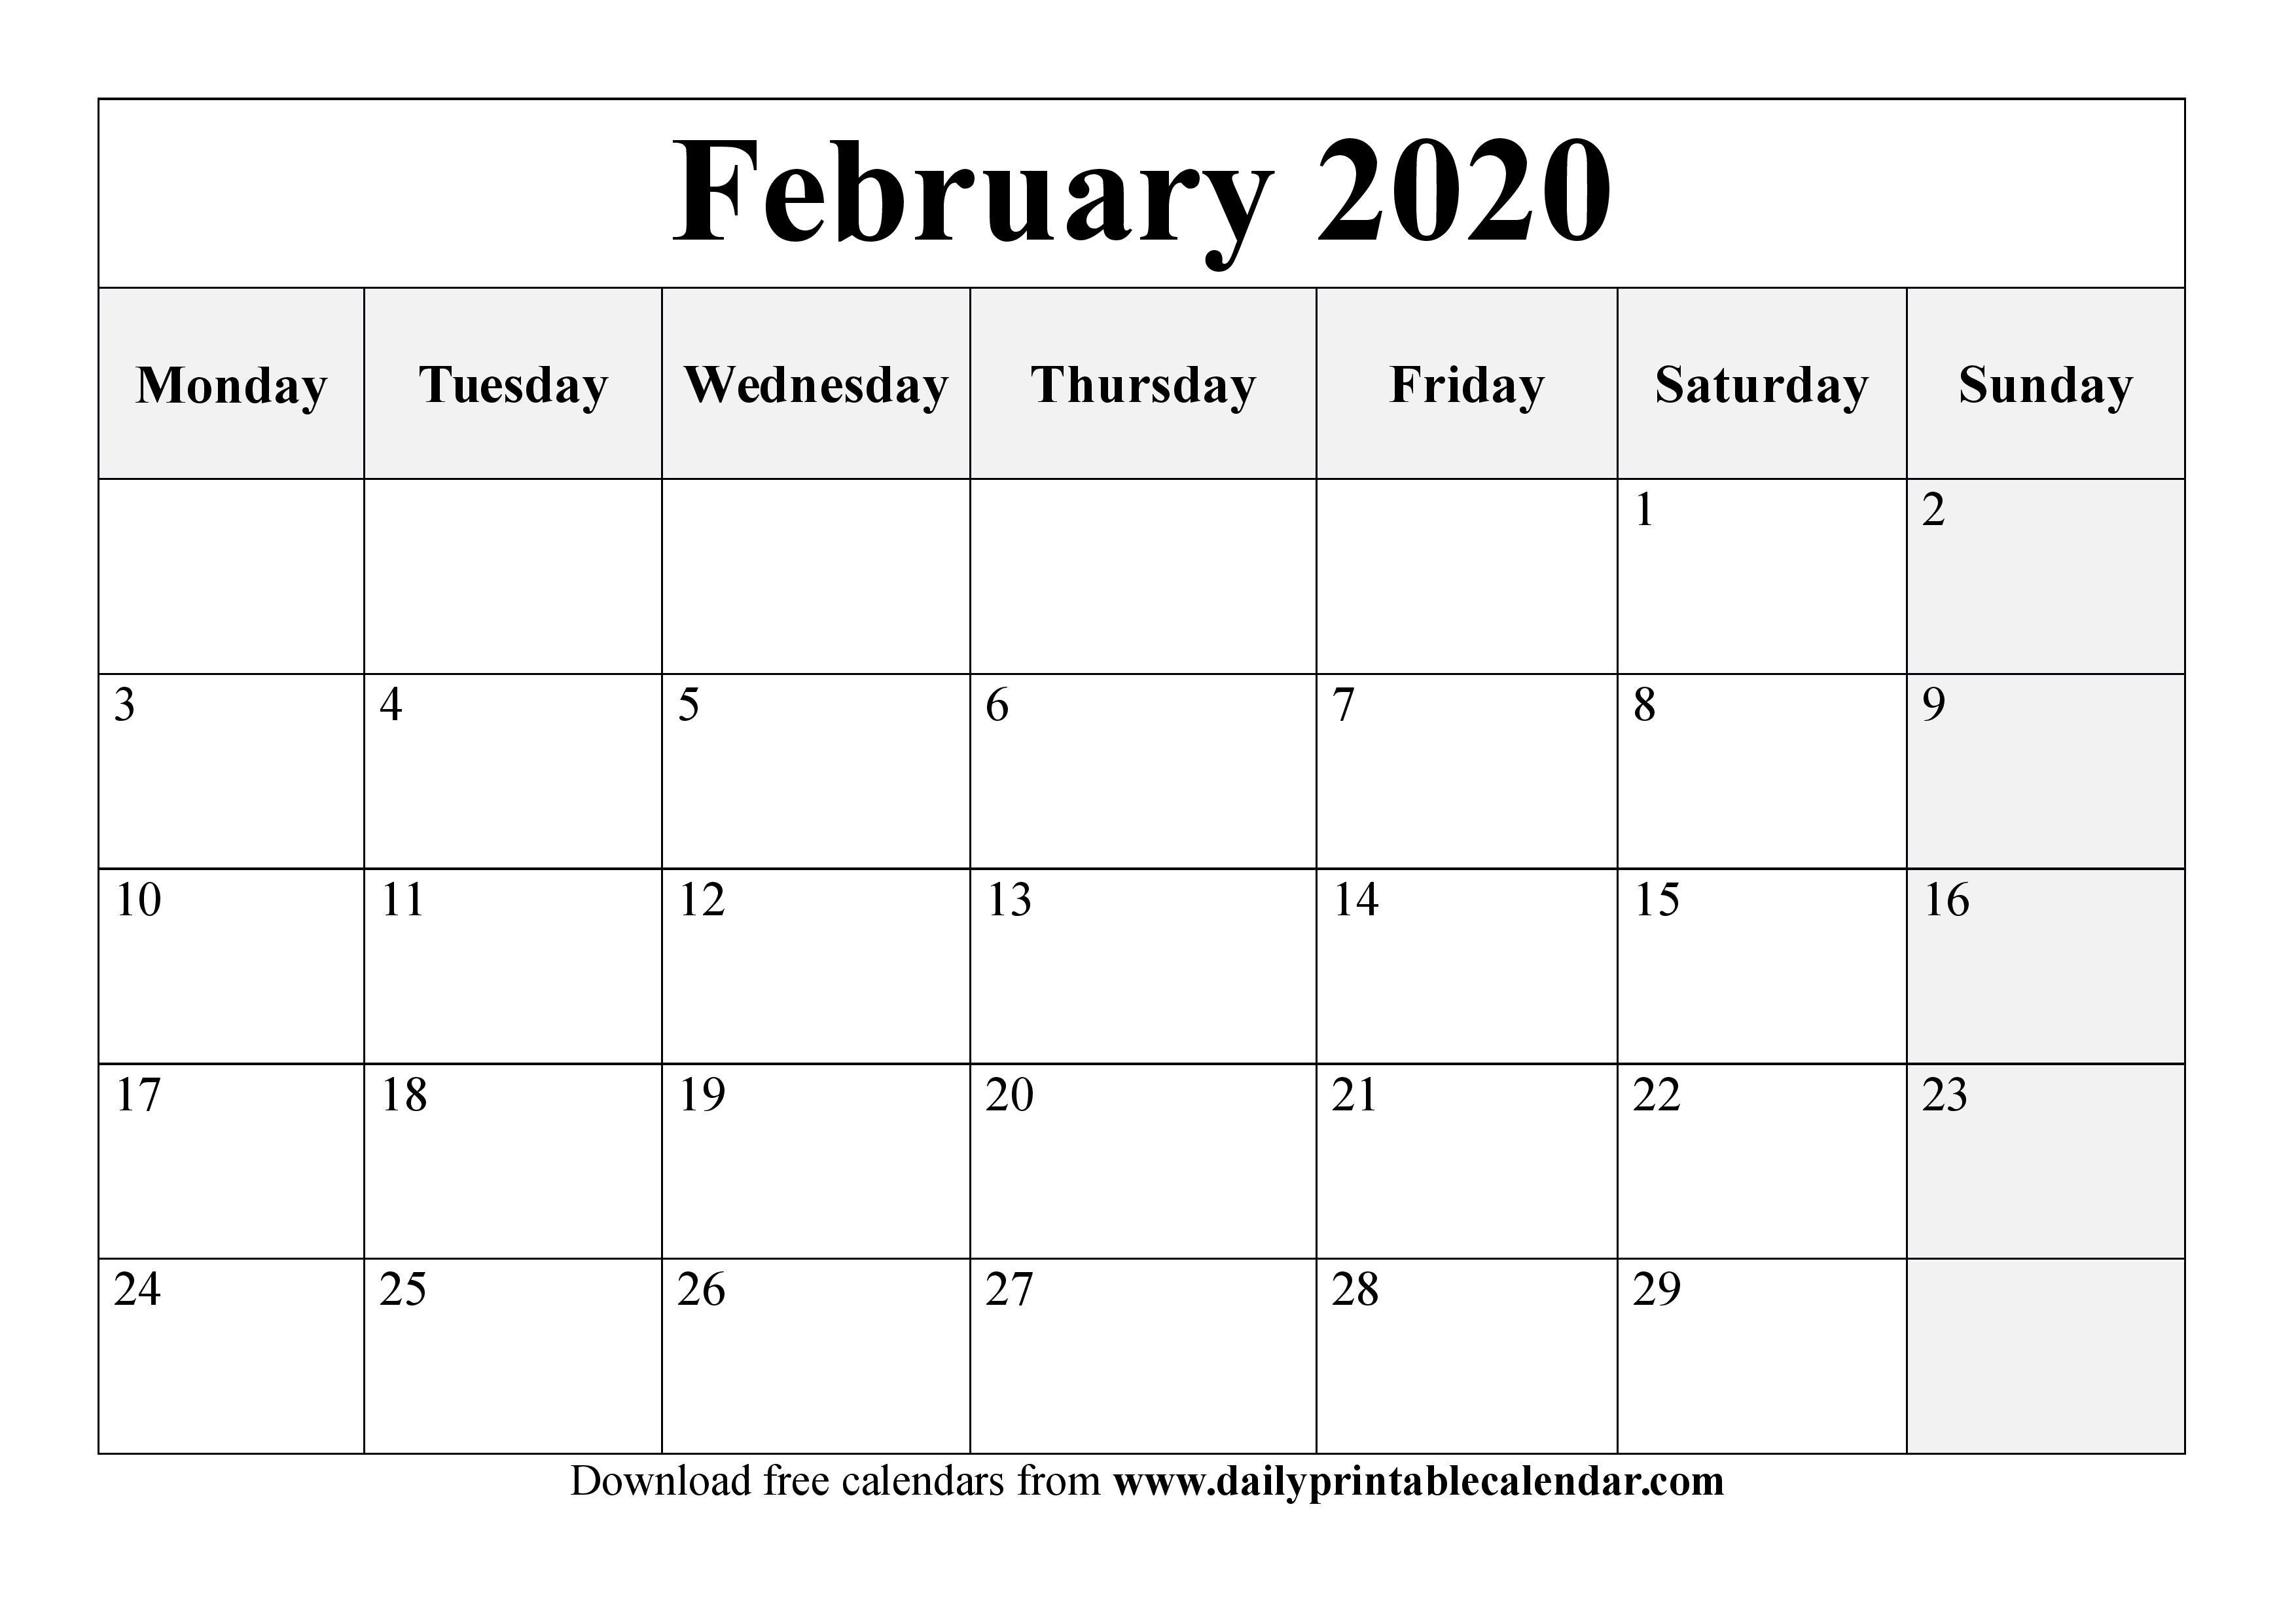 February 2020 Calendar Printable - Blank Templates - 2020